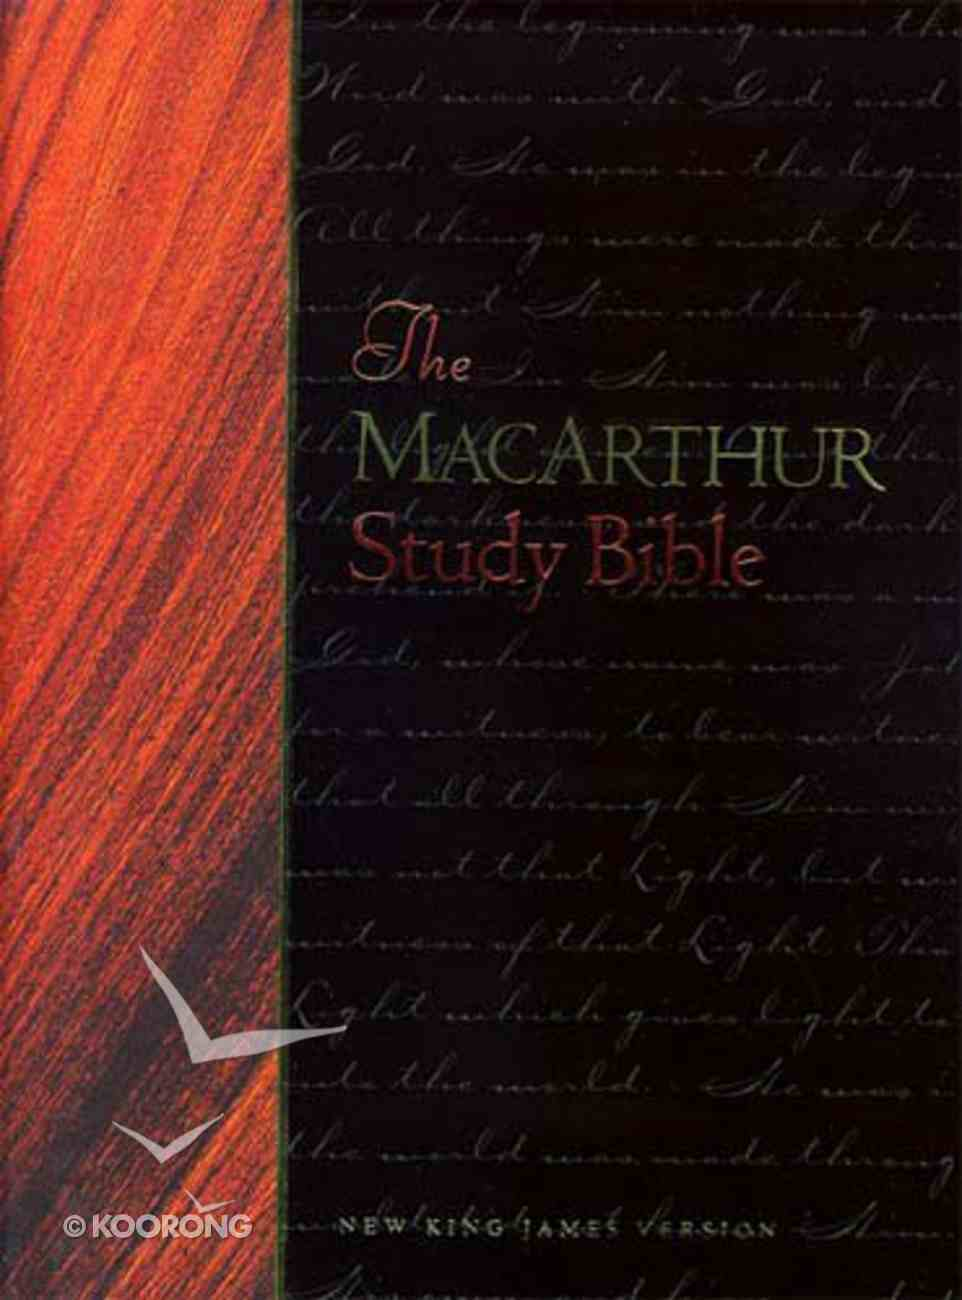 Macarthur Study Bible NKJV CDROM CD-rom